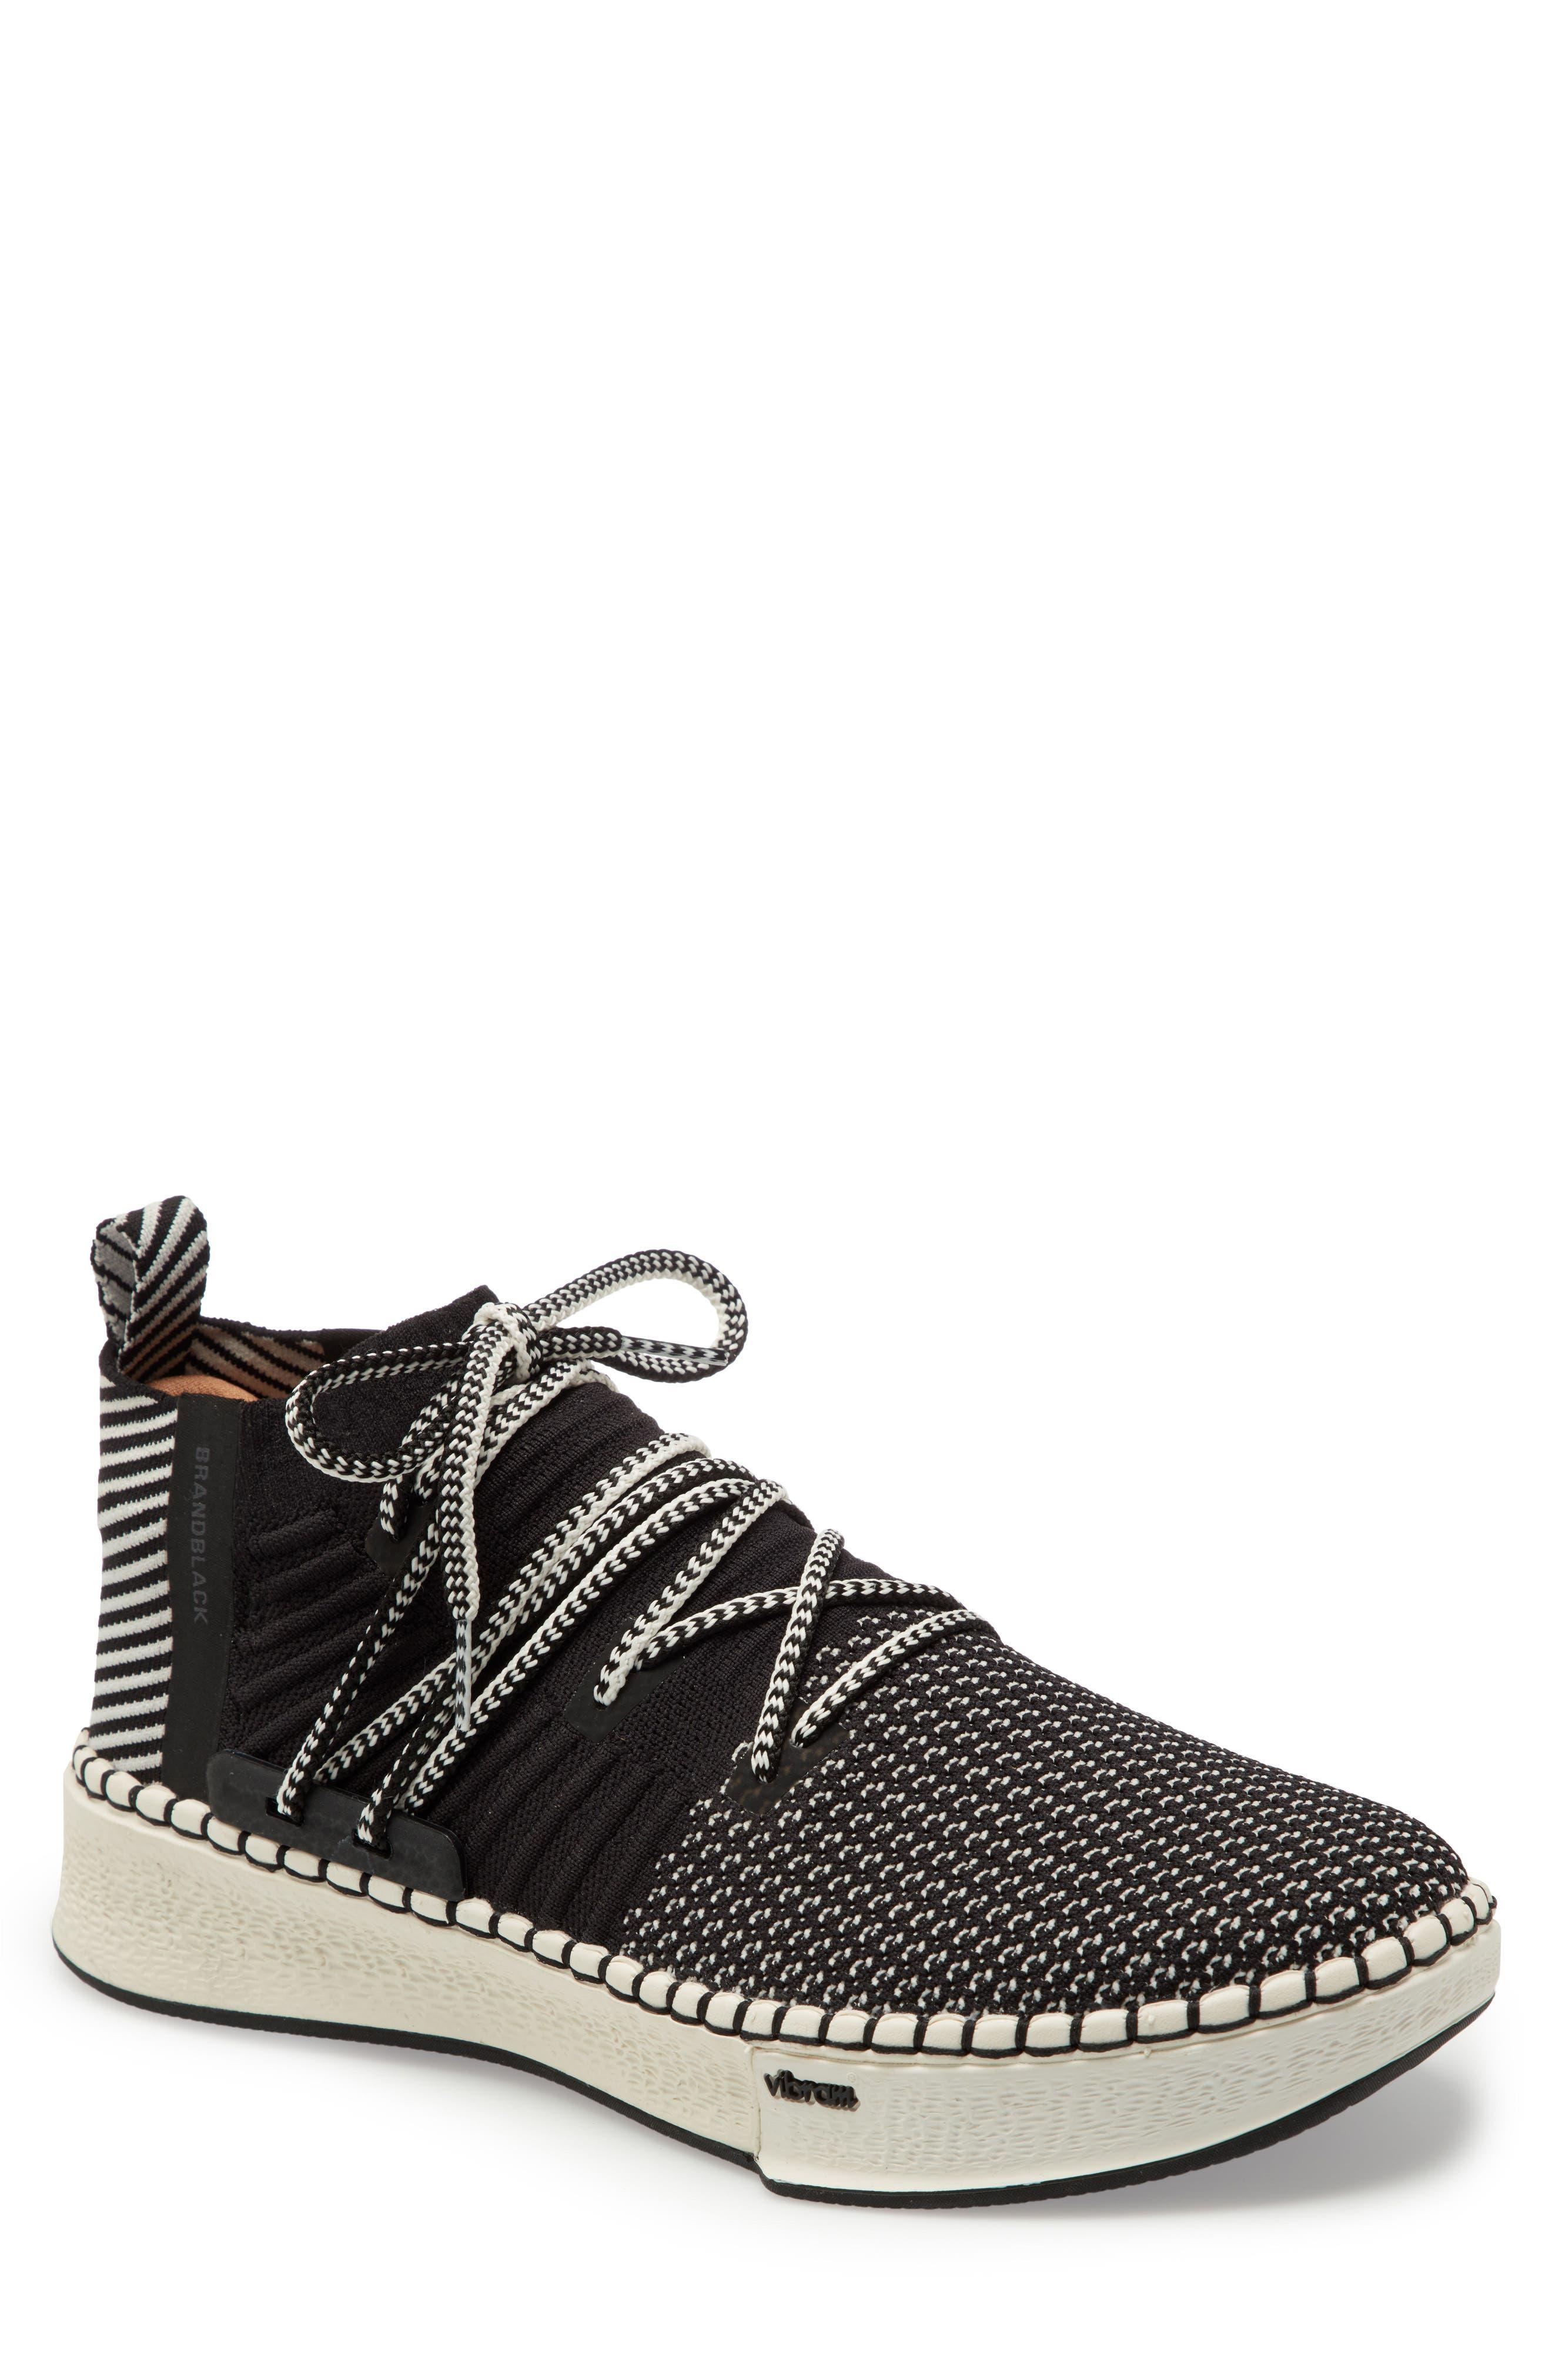 Delta Sneaker,                         Main,                         color,